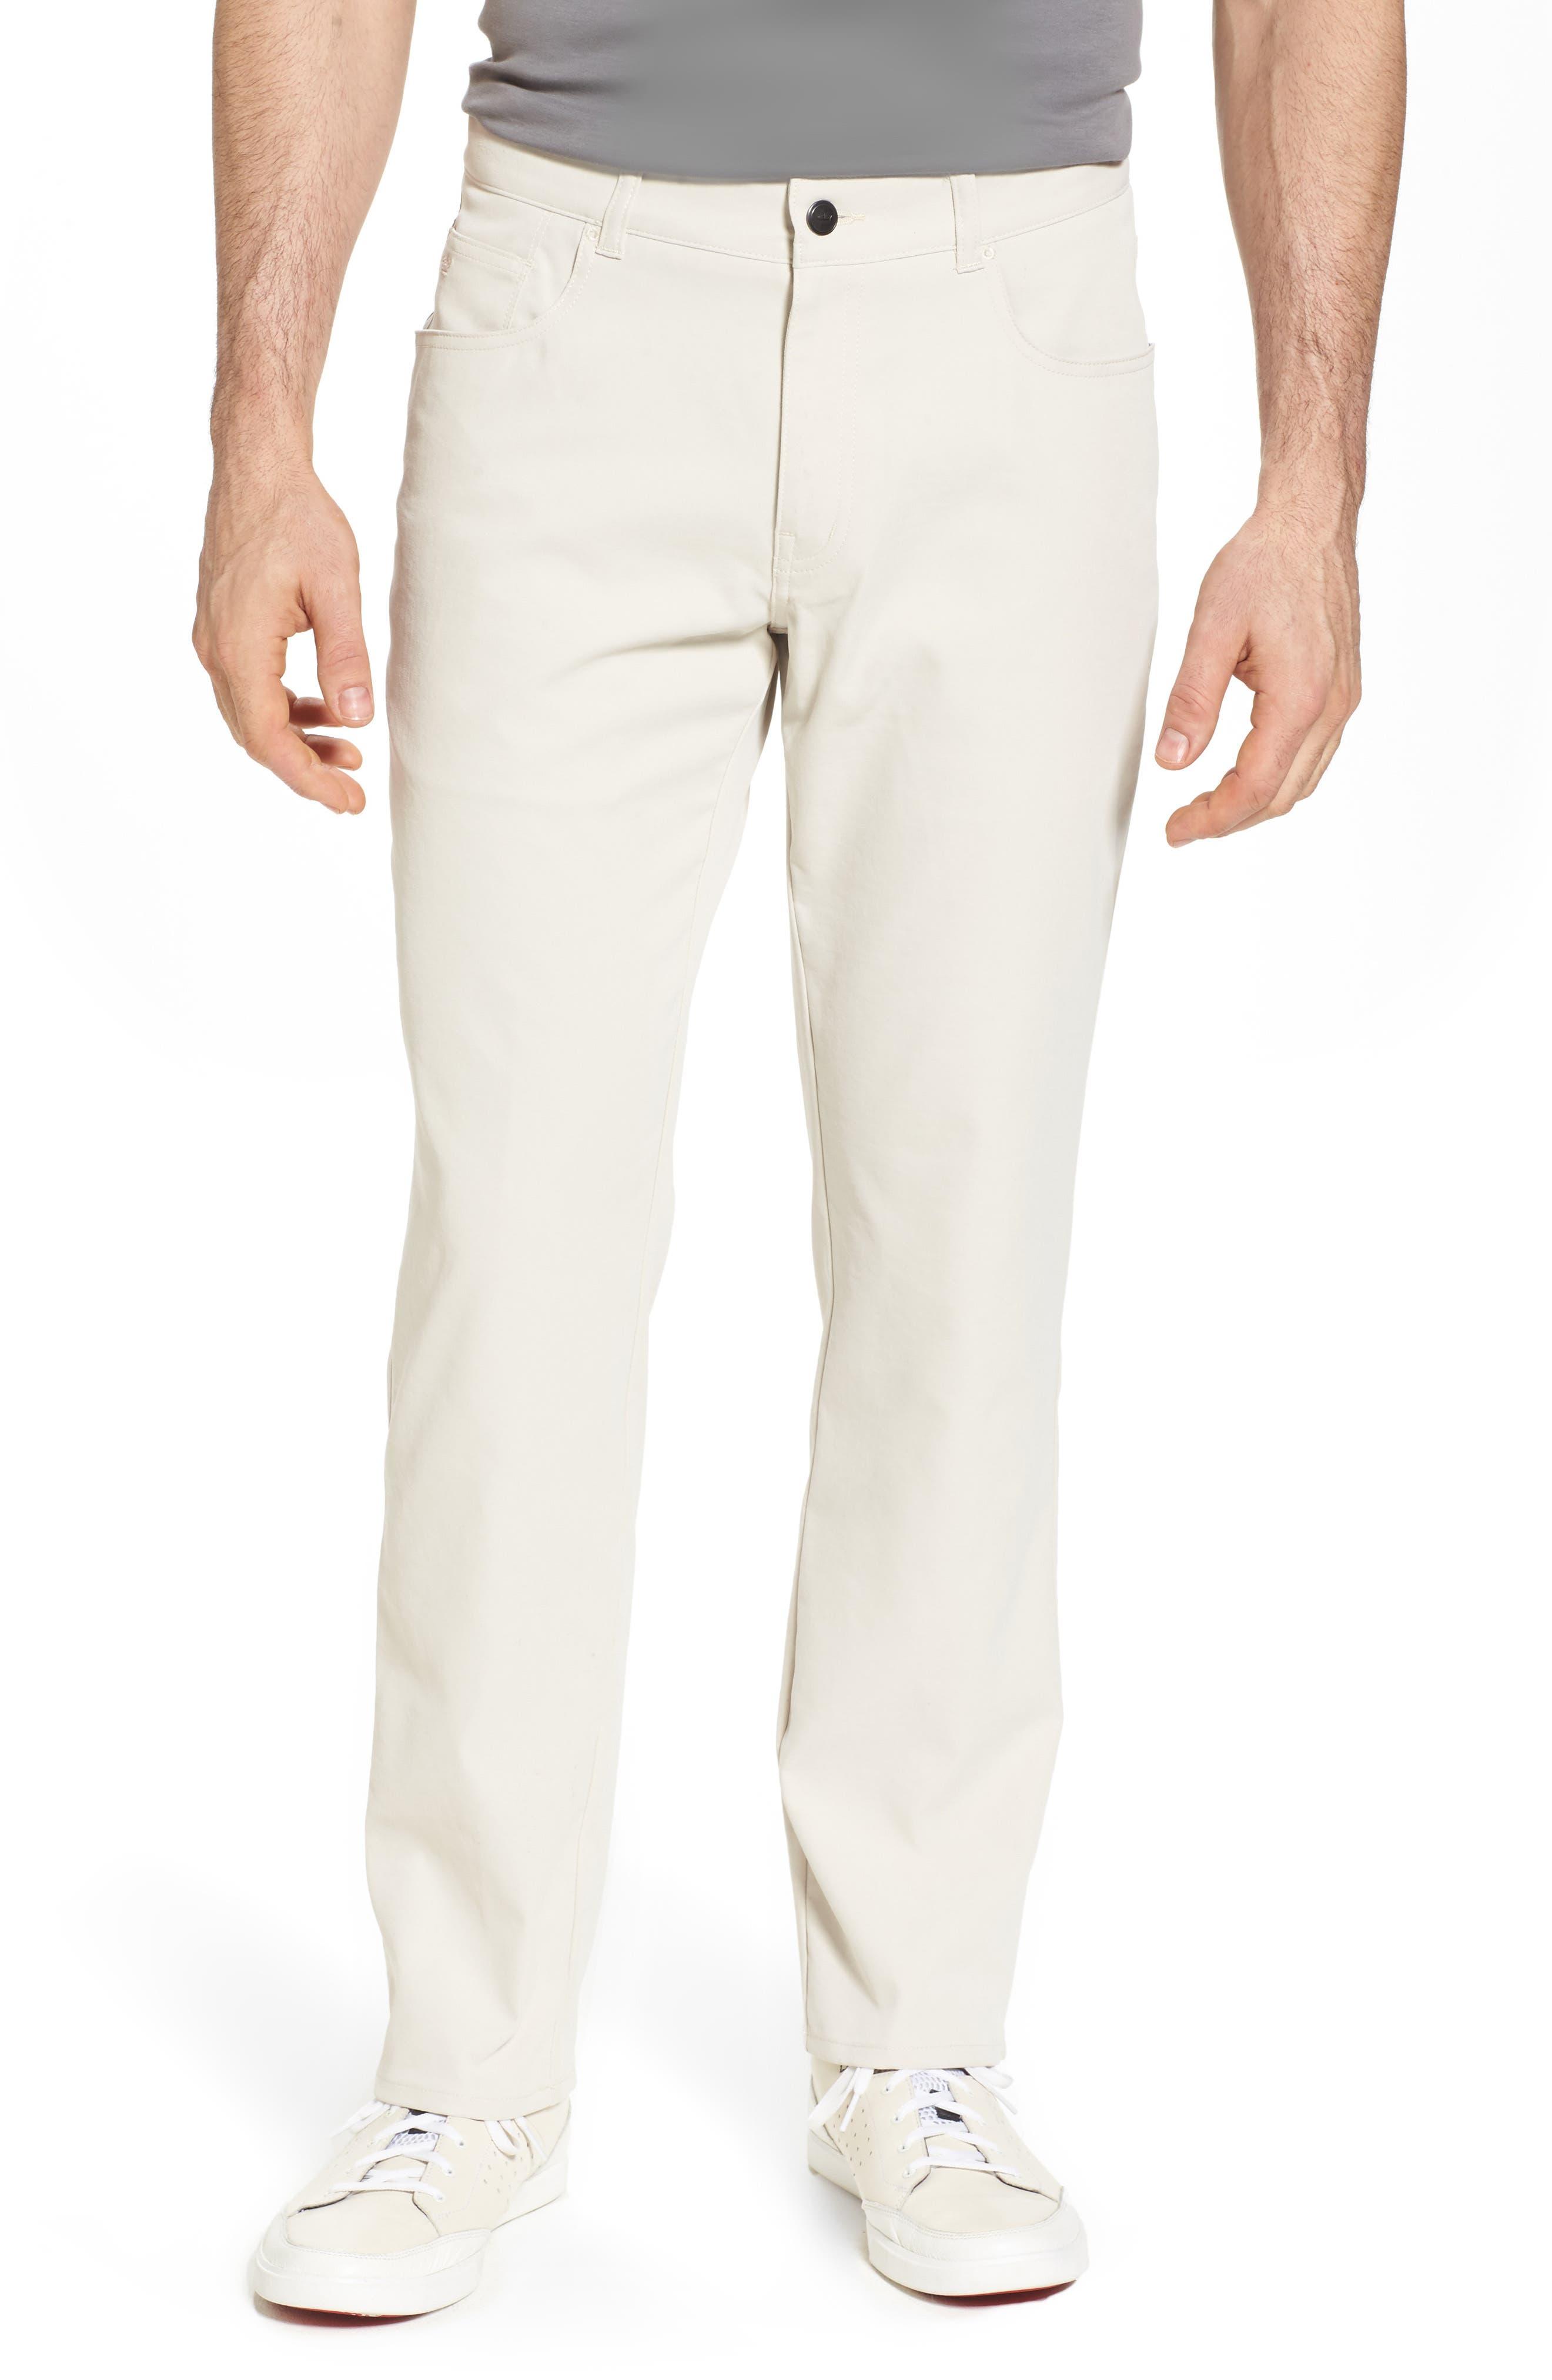 EB66 Performance Six-Pocket Pants,                             Main thumbnail 4, color,